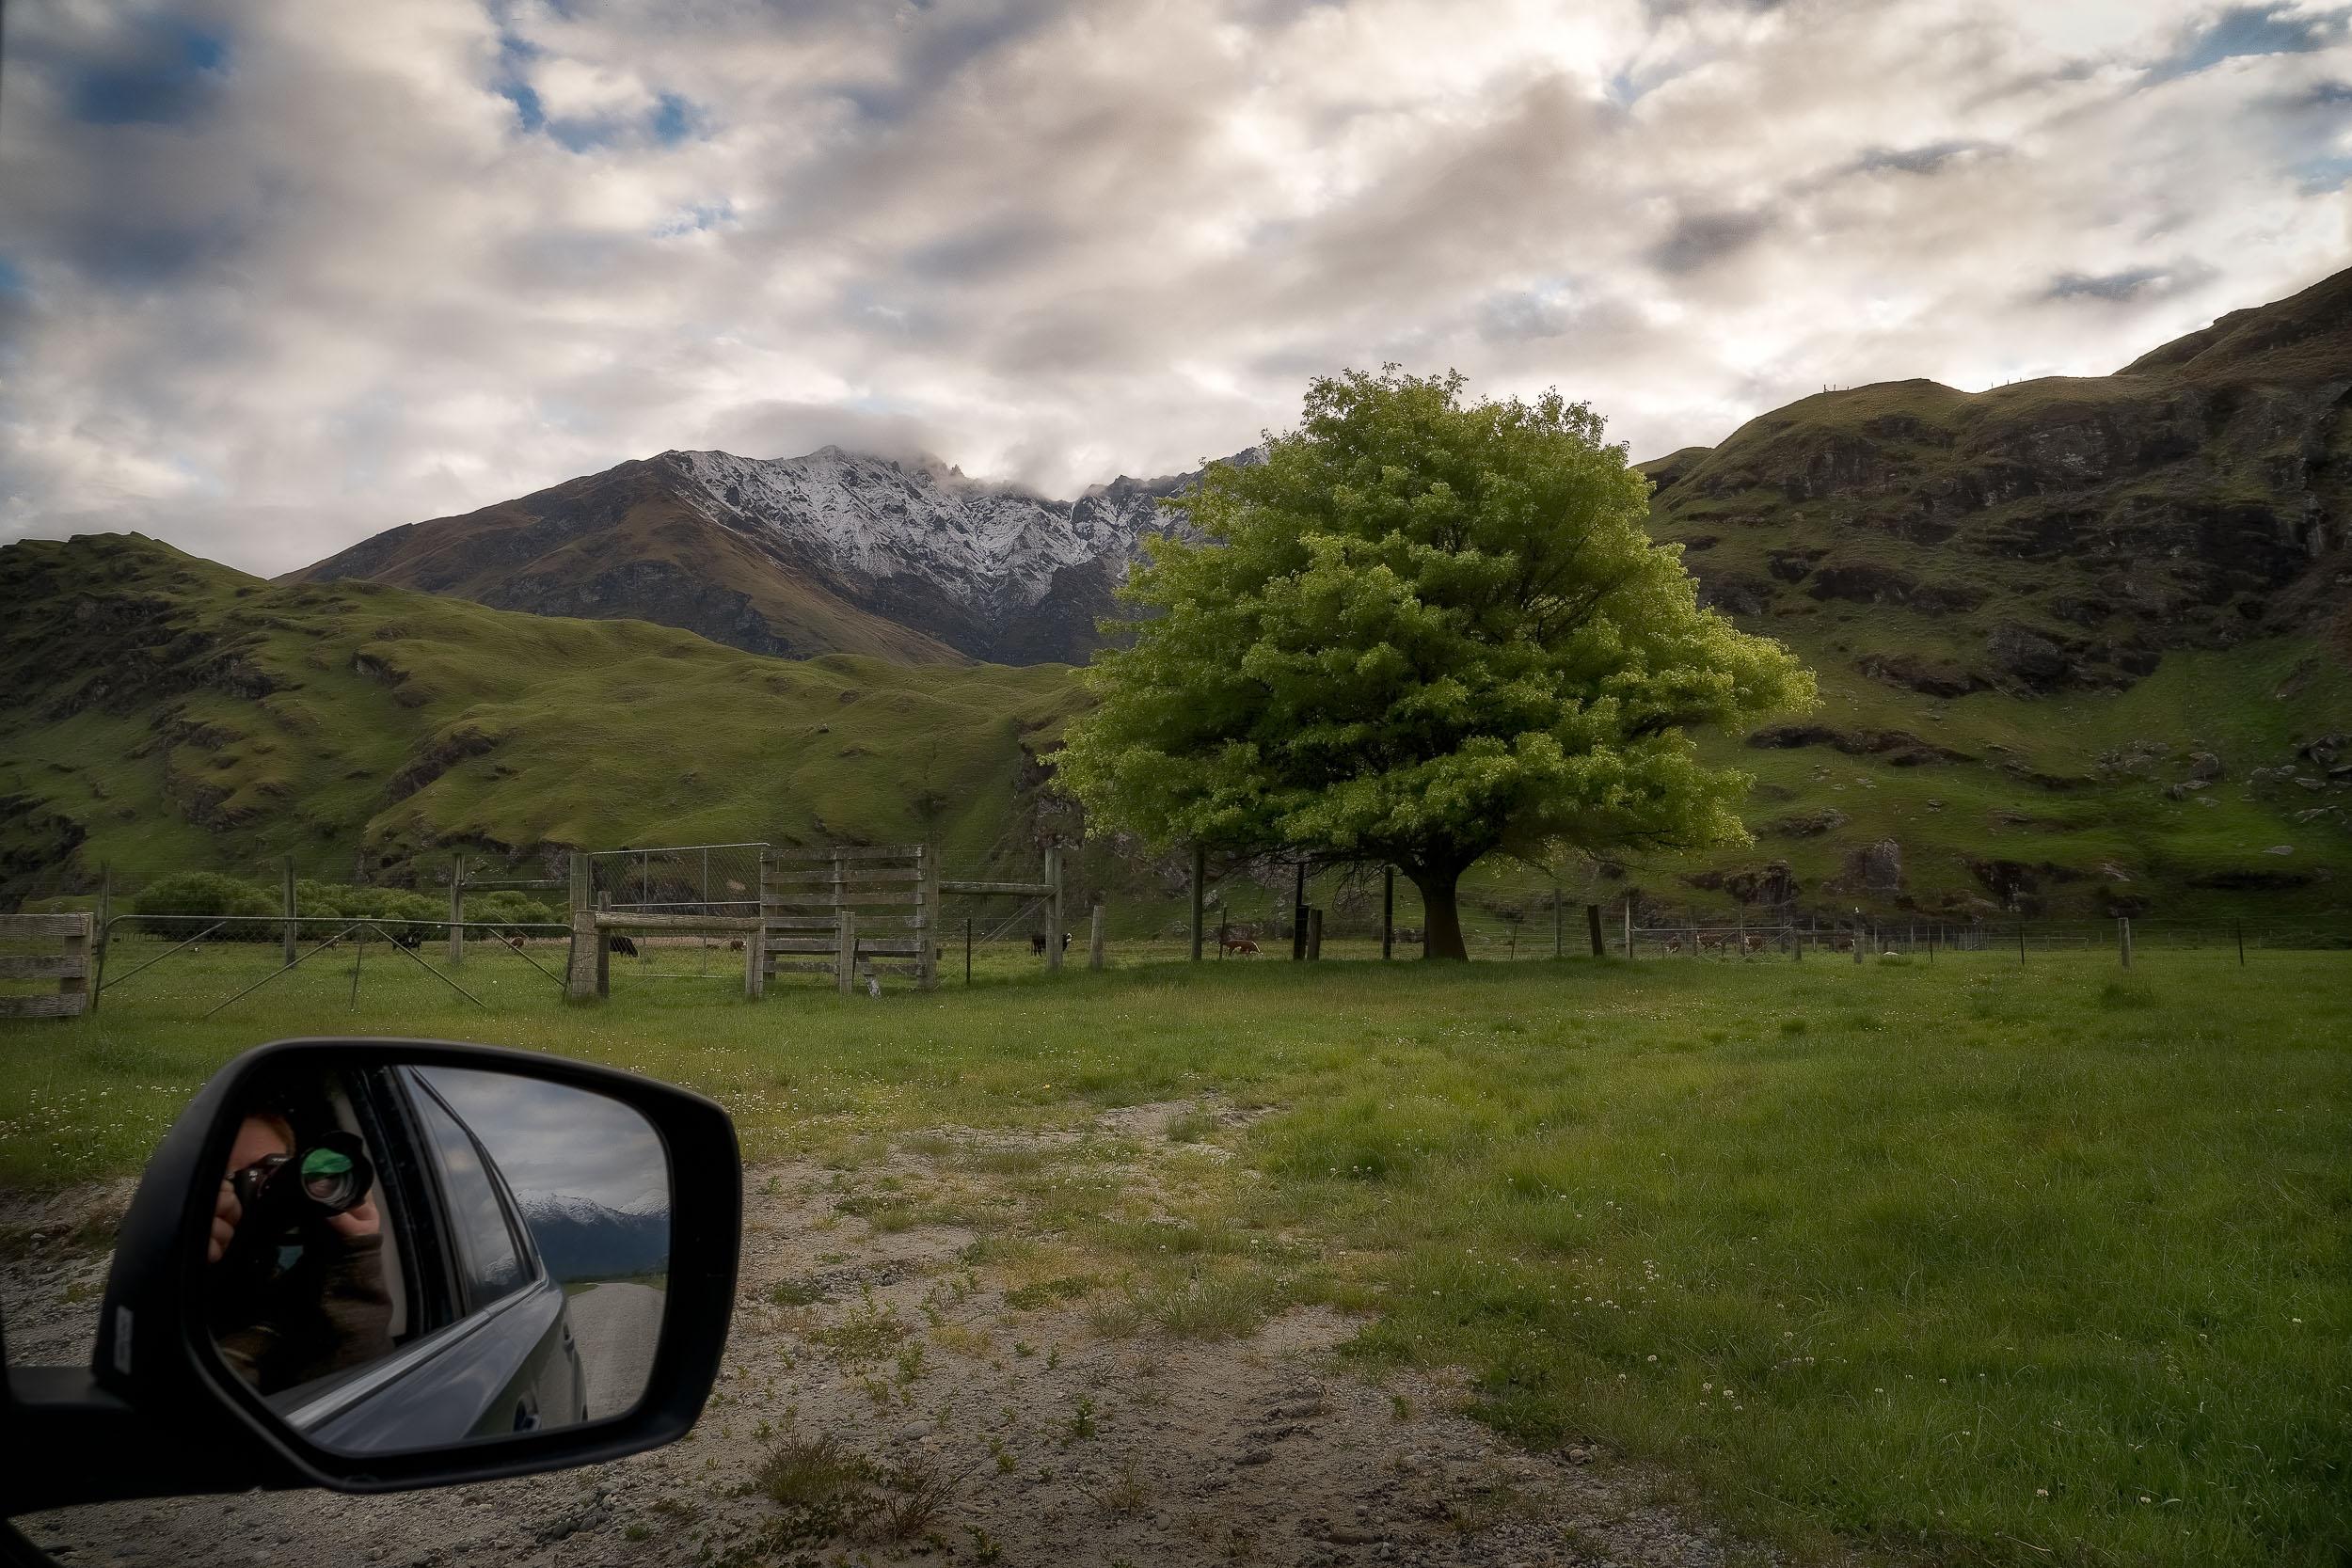 A    self portrait    of    Glenn Guy, the Travel Photography Guru   , on the    Mt Aspiring Road    near    Wanaka, New Zealand   .